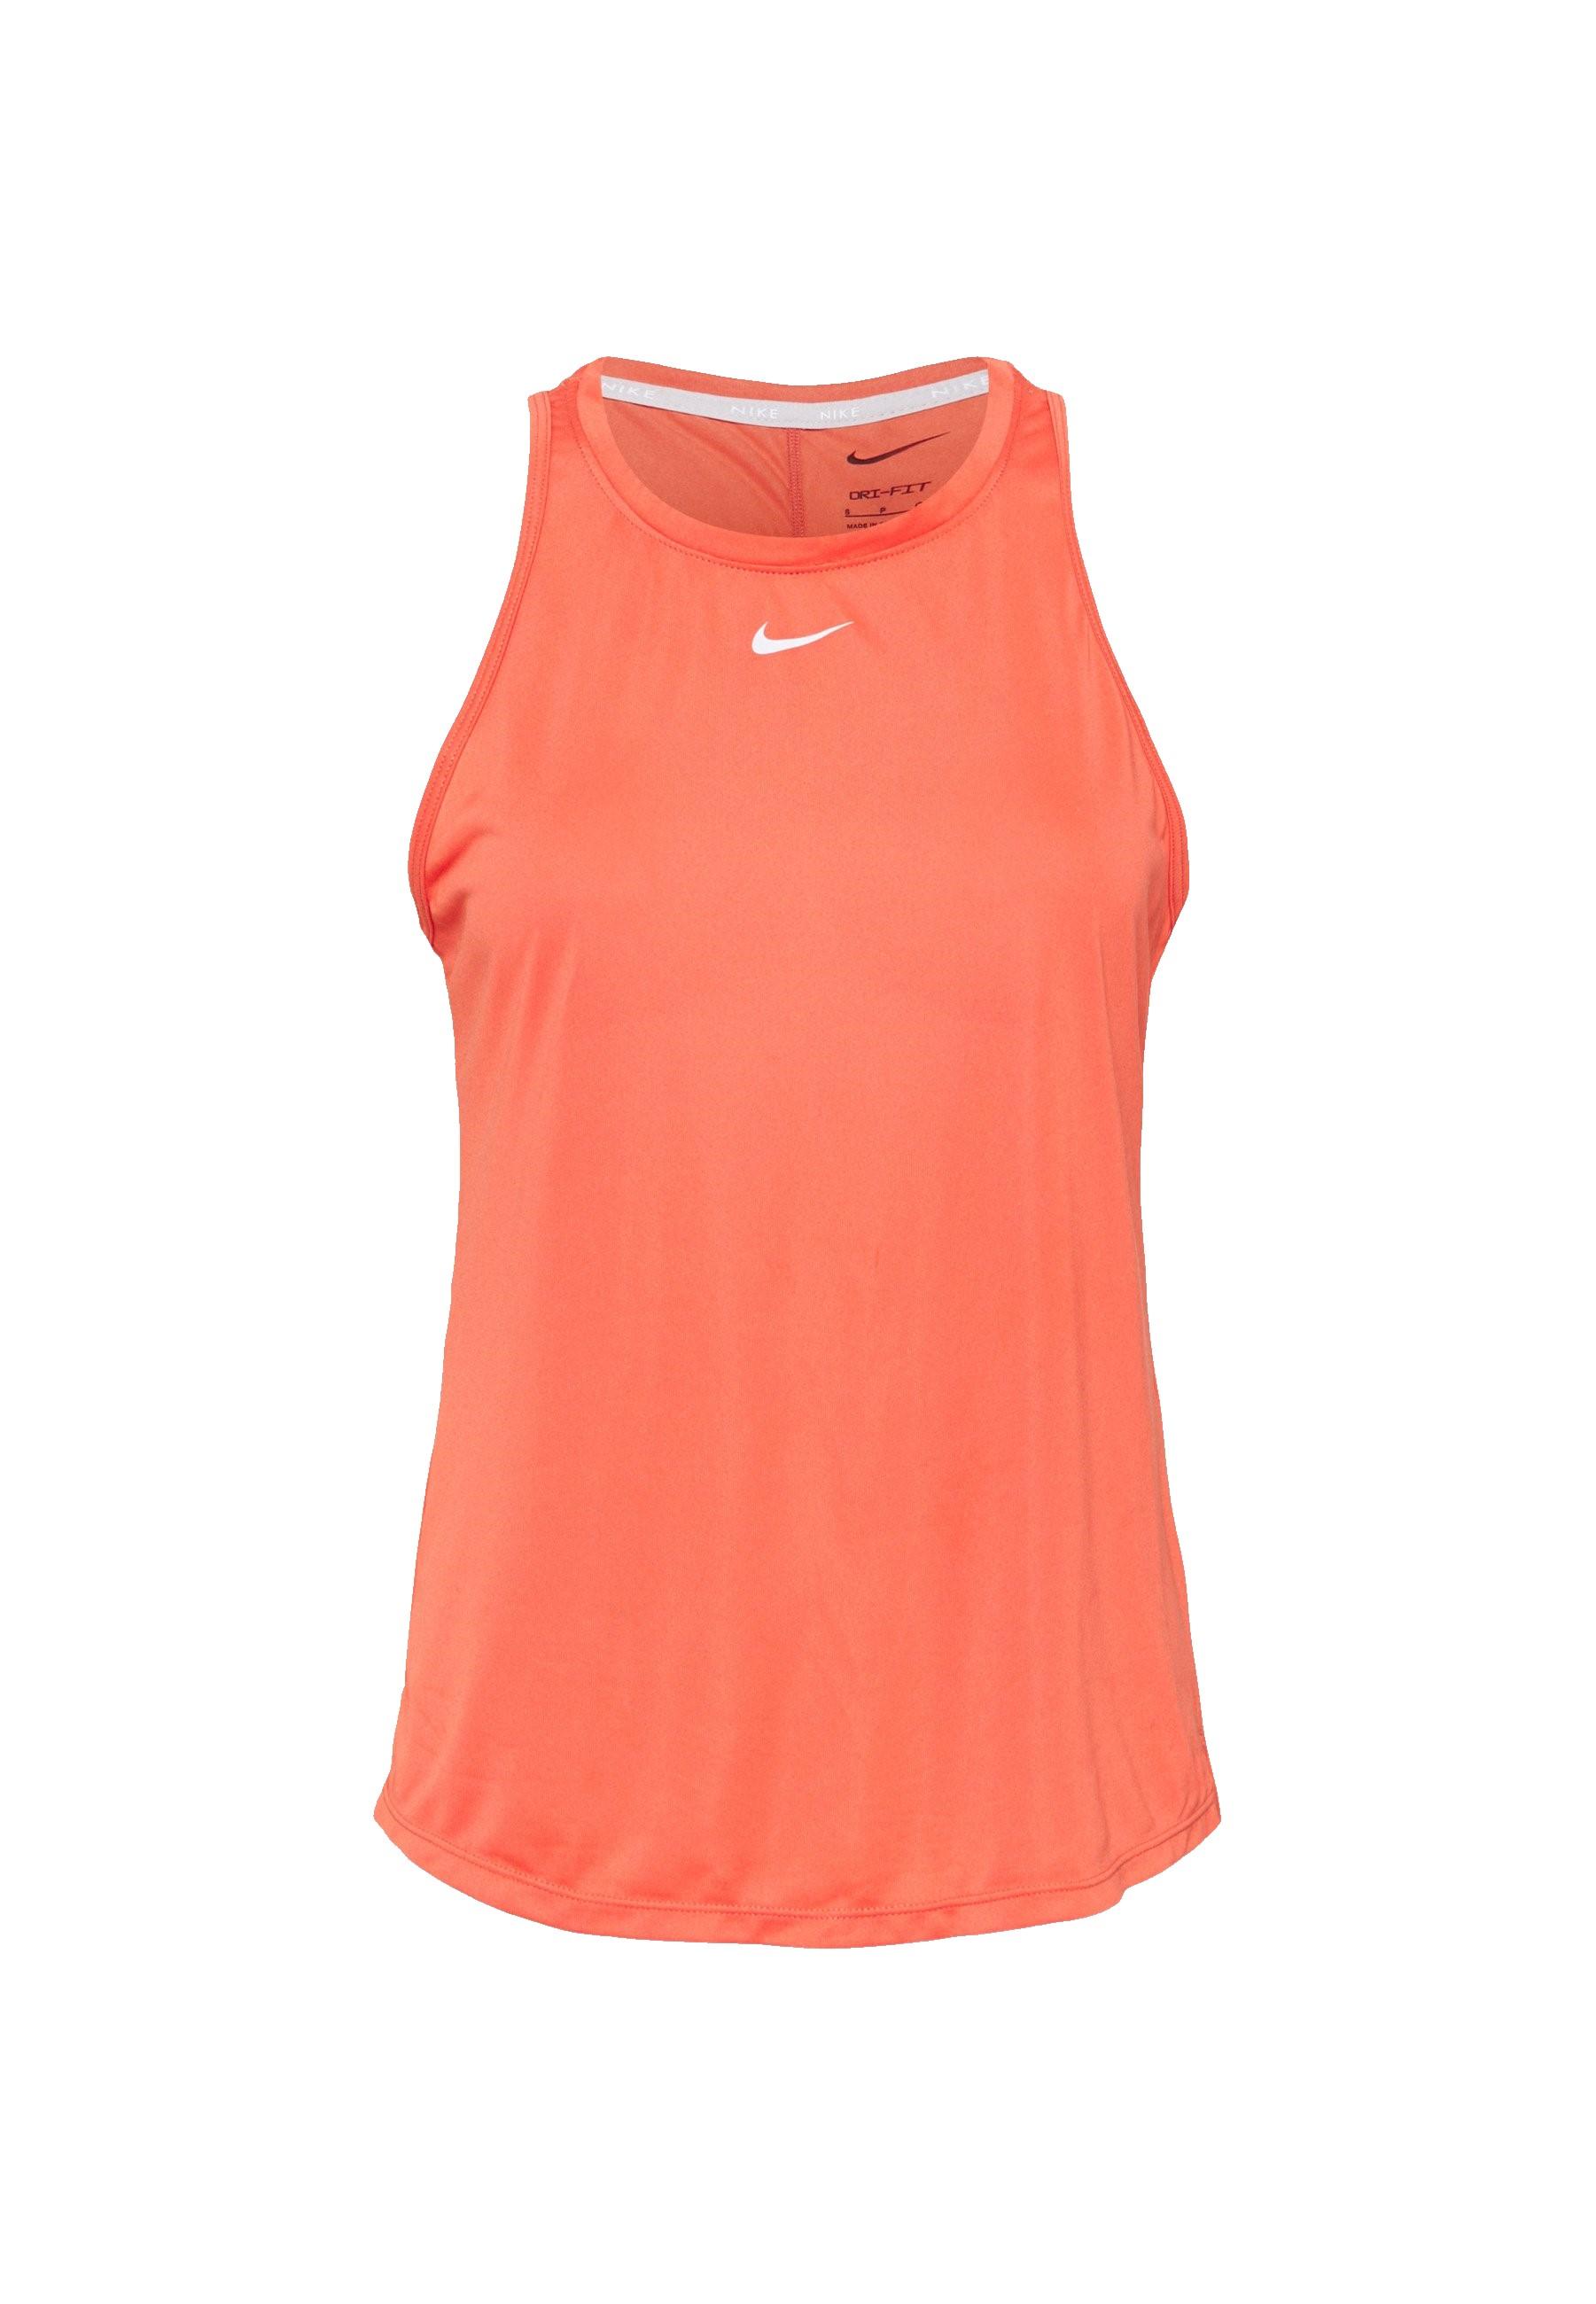 Oranje/Roze dames tanktop Nike One -DD0636-814